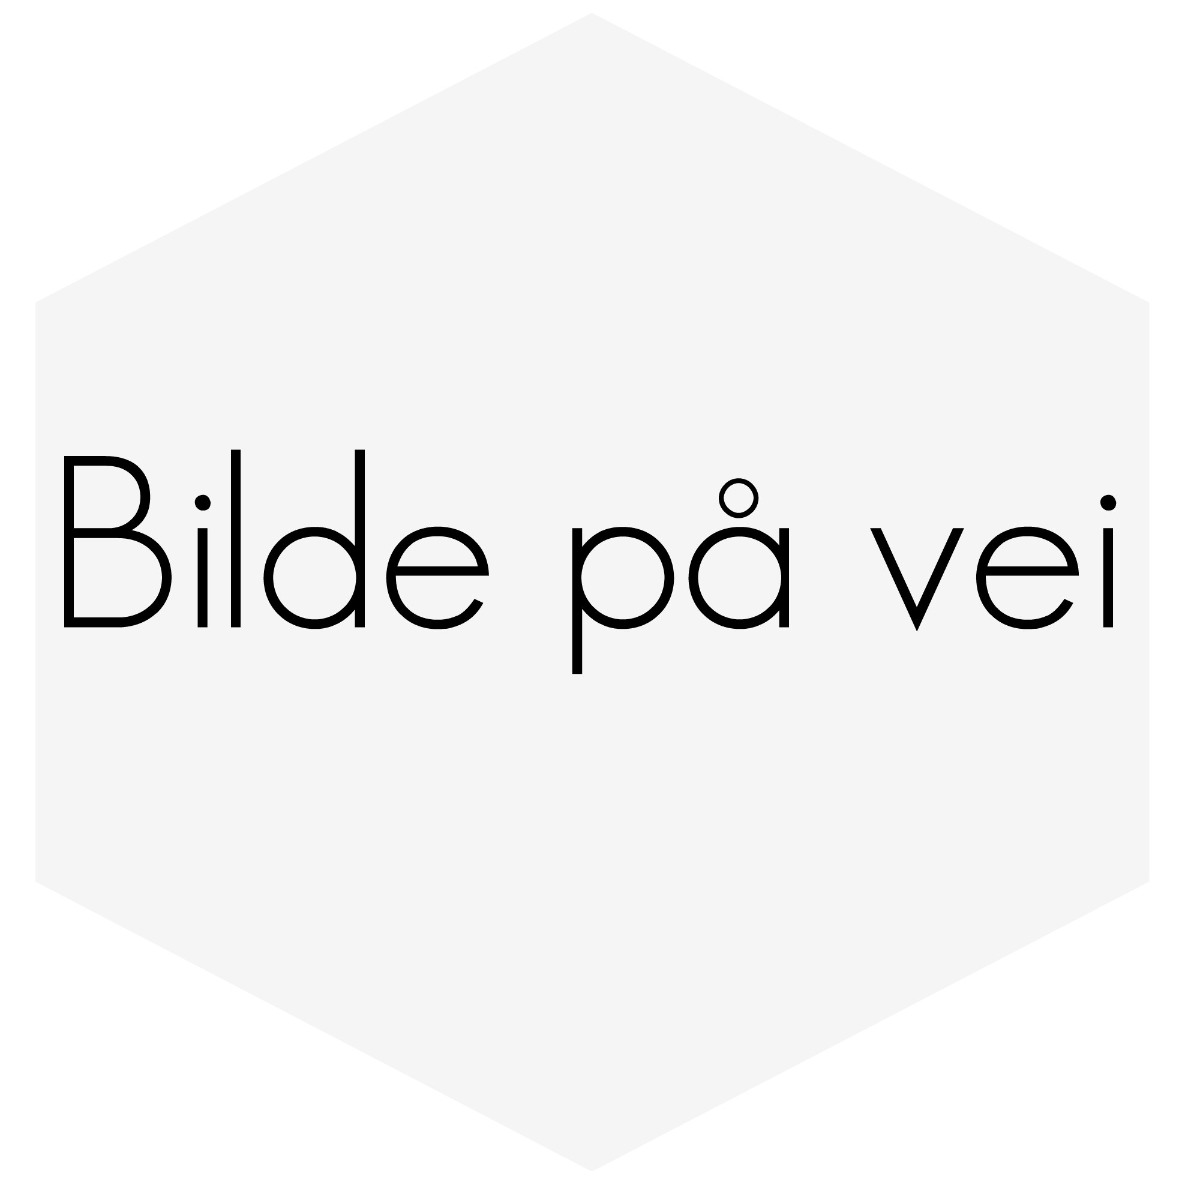 "SILIKONSLANGE RØD REDUSERING 2,75-3"" (70-76MM)"